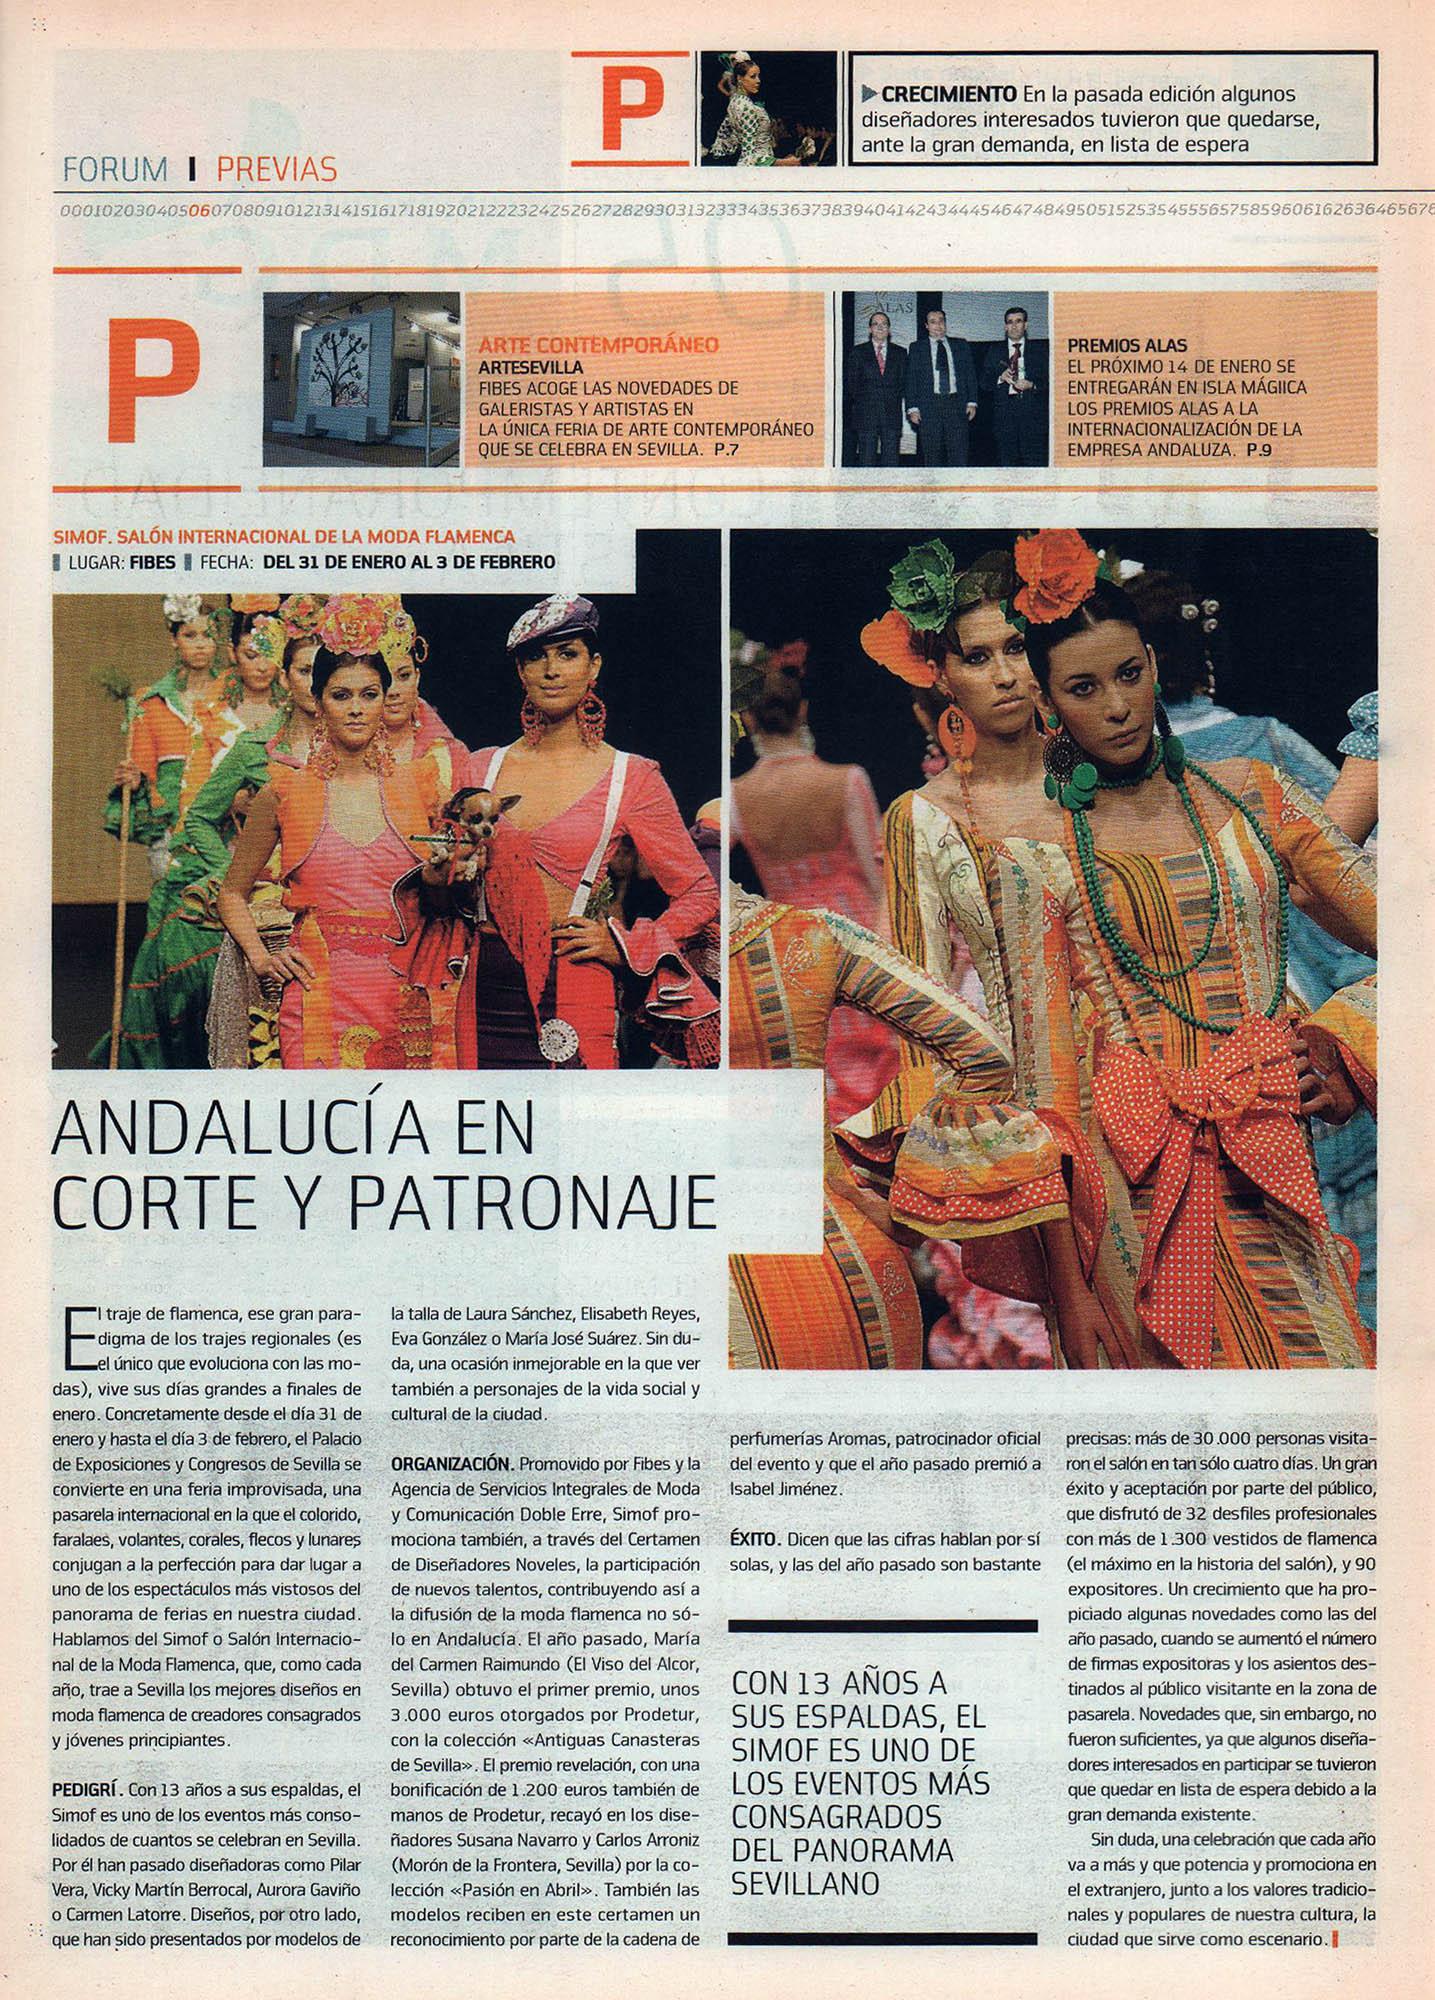 Andalucia, en corte y patronaje - Simof, Salón Internacional de la Moda Flamenca | Fórum - ABC de Sevilla | ene 2008